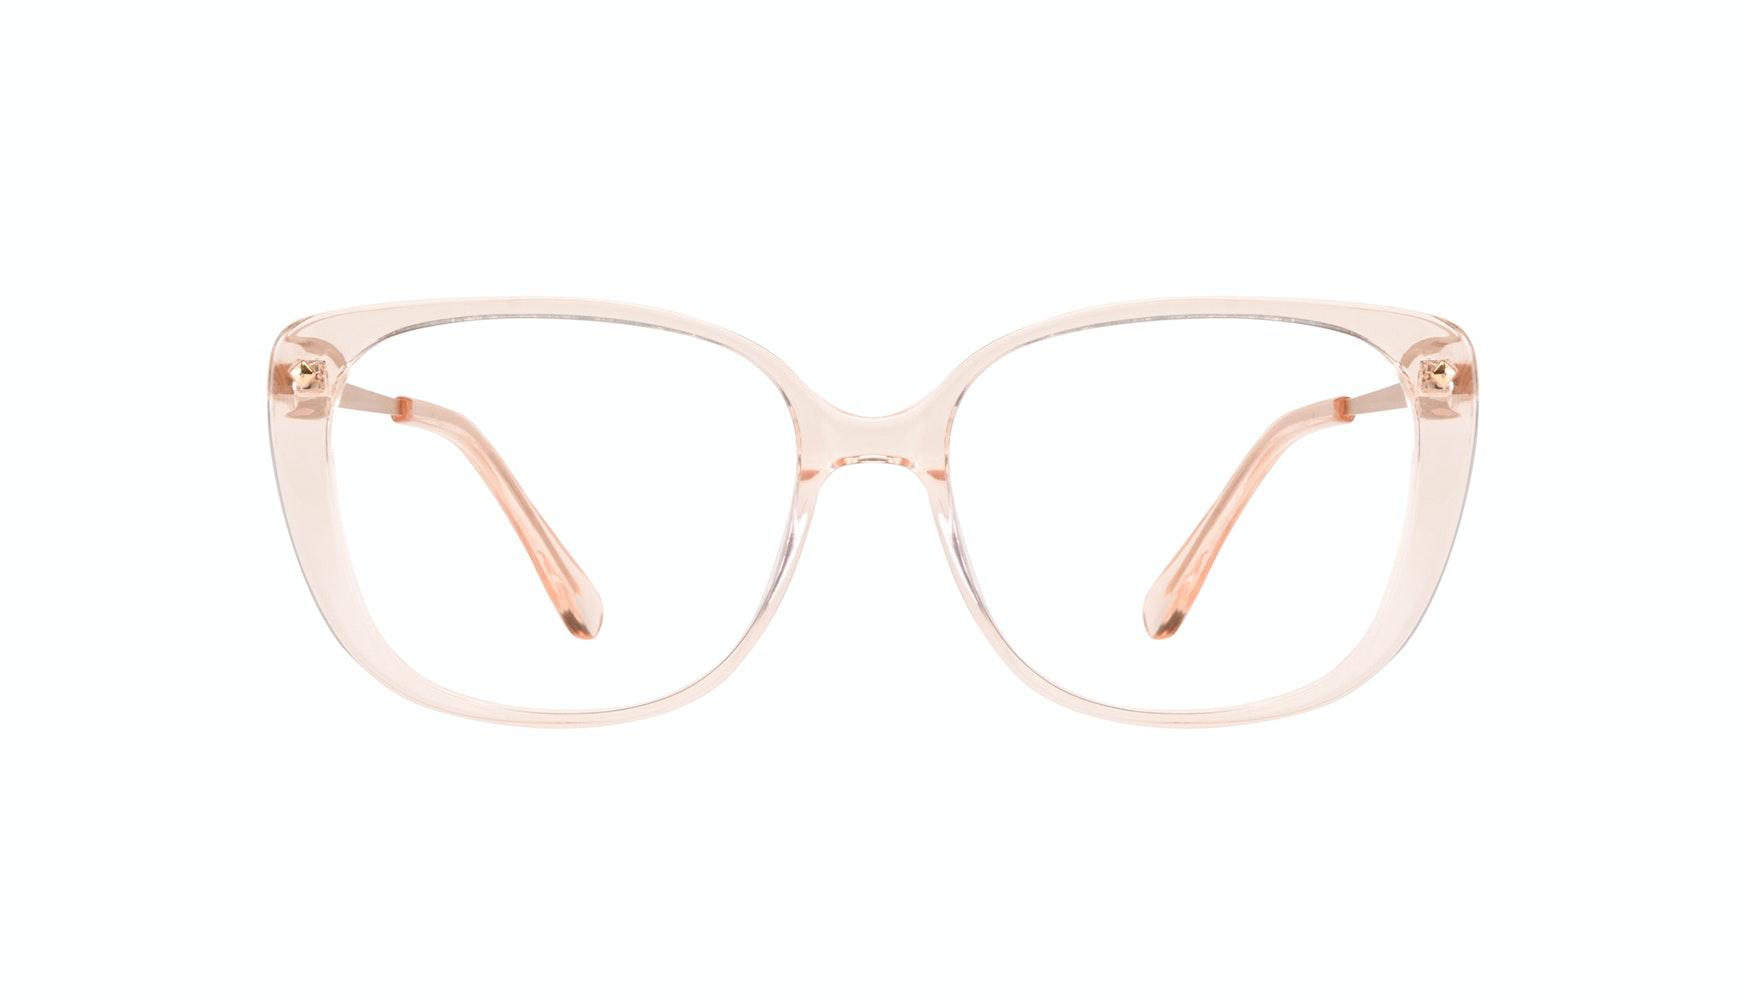 Affordable Fashion Glasses Square Eyeglasses Women Japonisme Blond Front